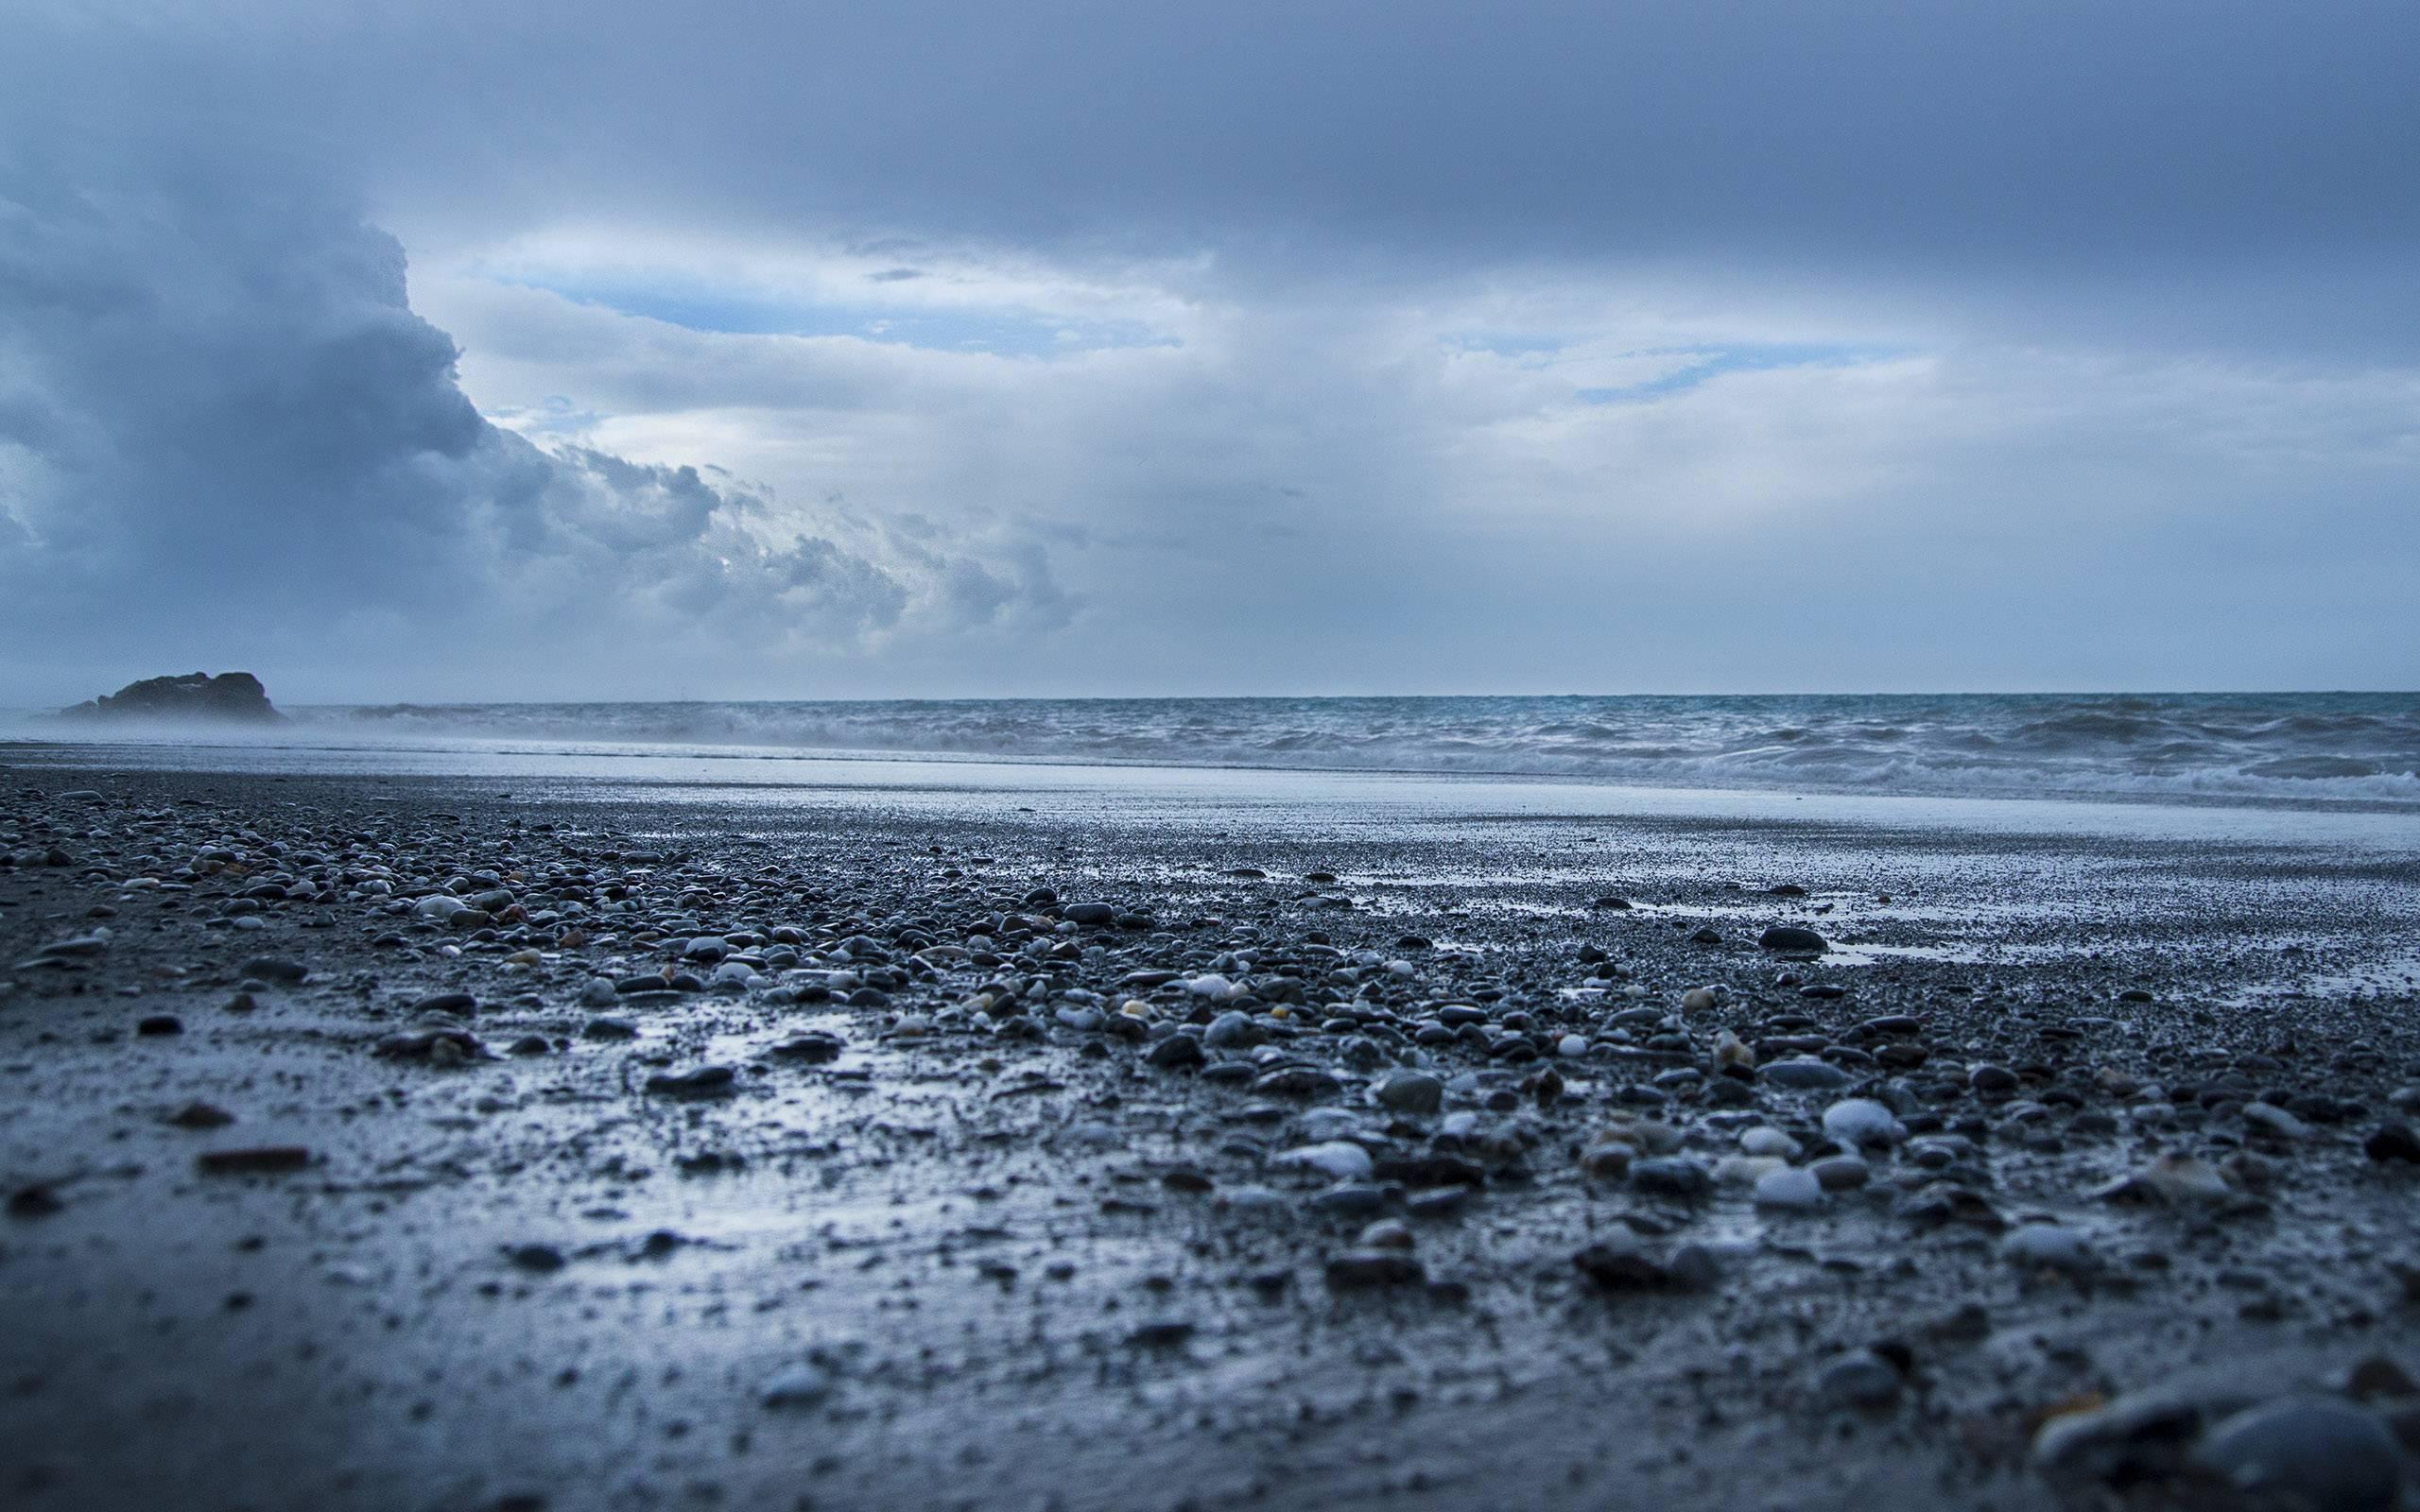 Beach_by_Renato_Giordanelli.jpg